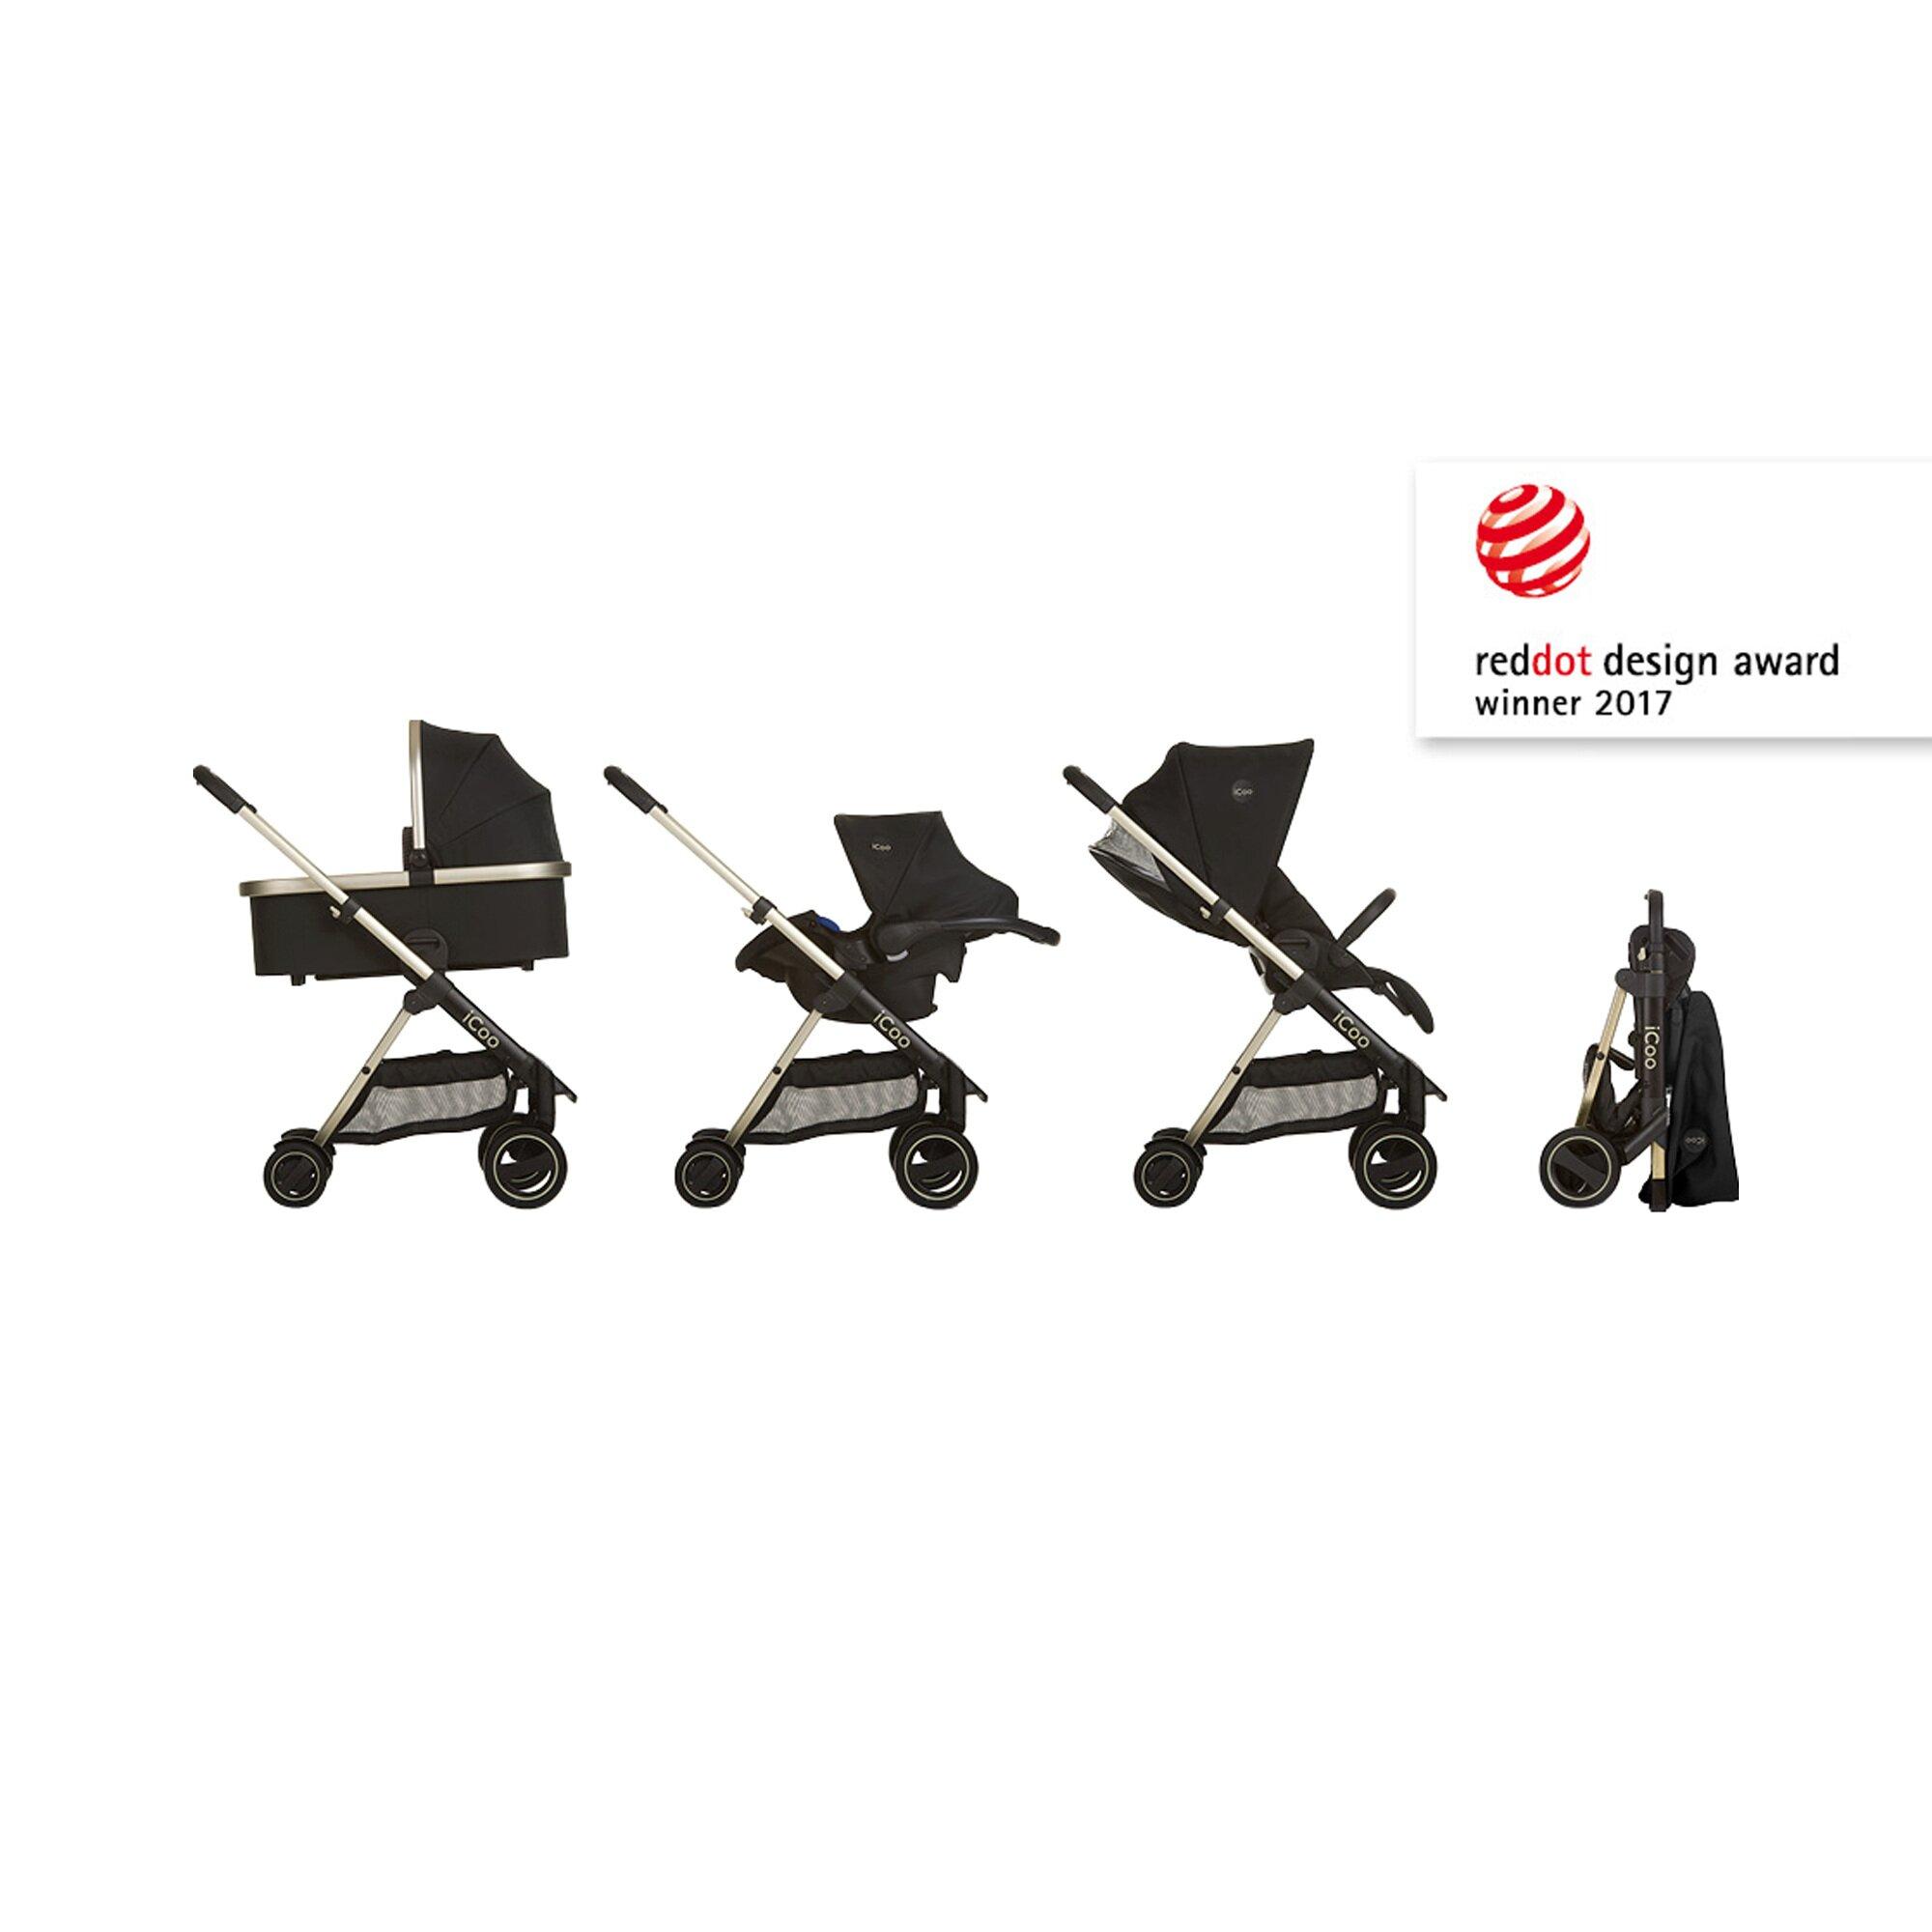 icoo-acrobat-xl-plus-kombikinderwagen-trio-set-incl-led-beleuchtung-schwarz